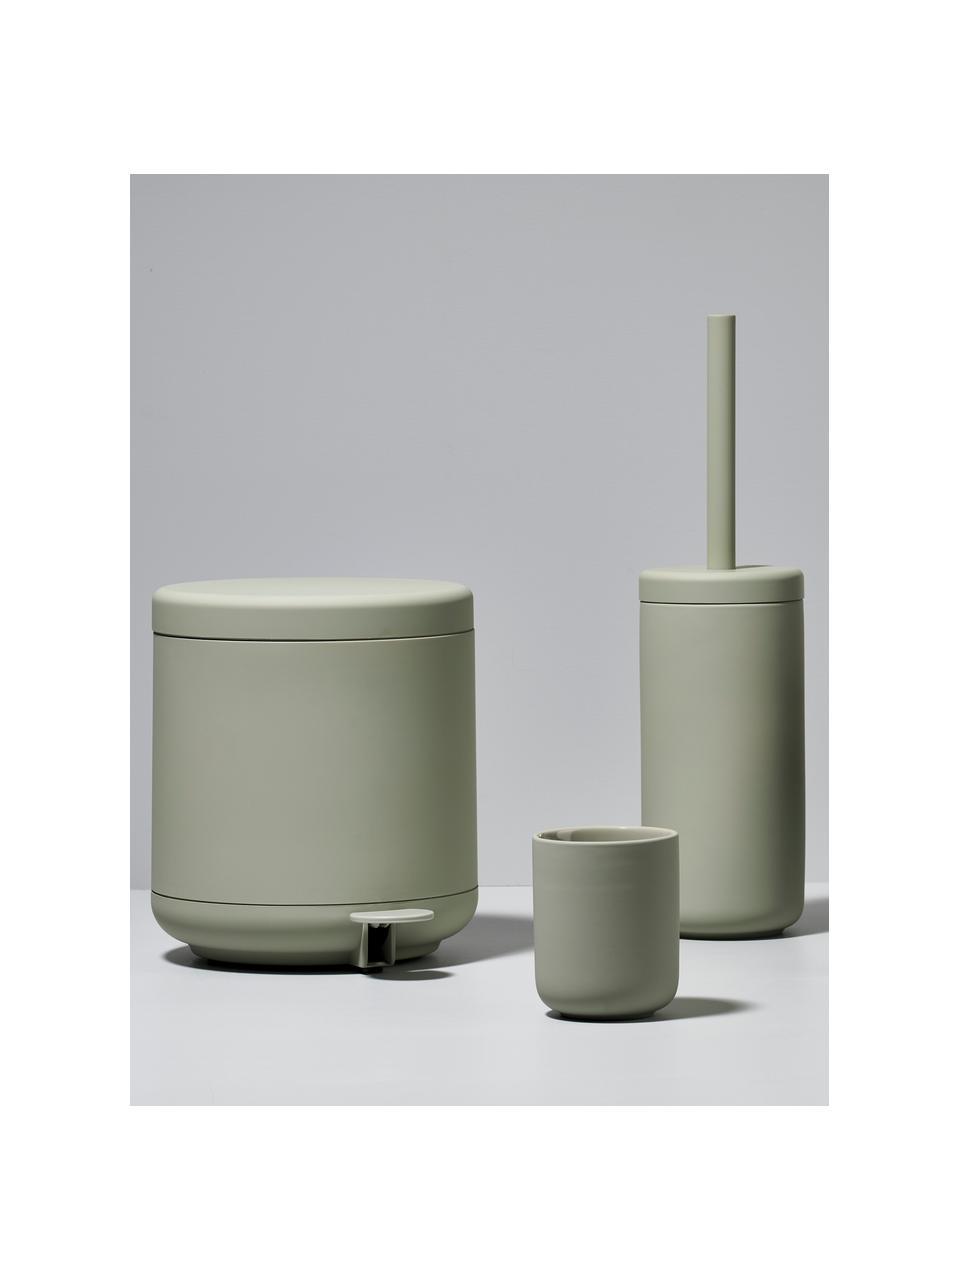 Pattumiera Ume, Plastica (ABS), Verde eucalipto, Ø 20 x Alt. 22 cm